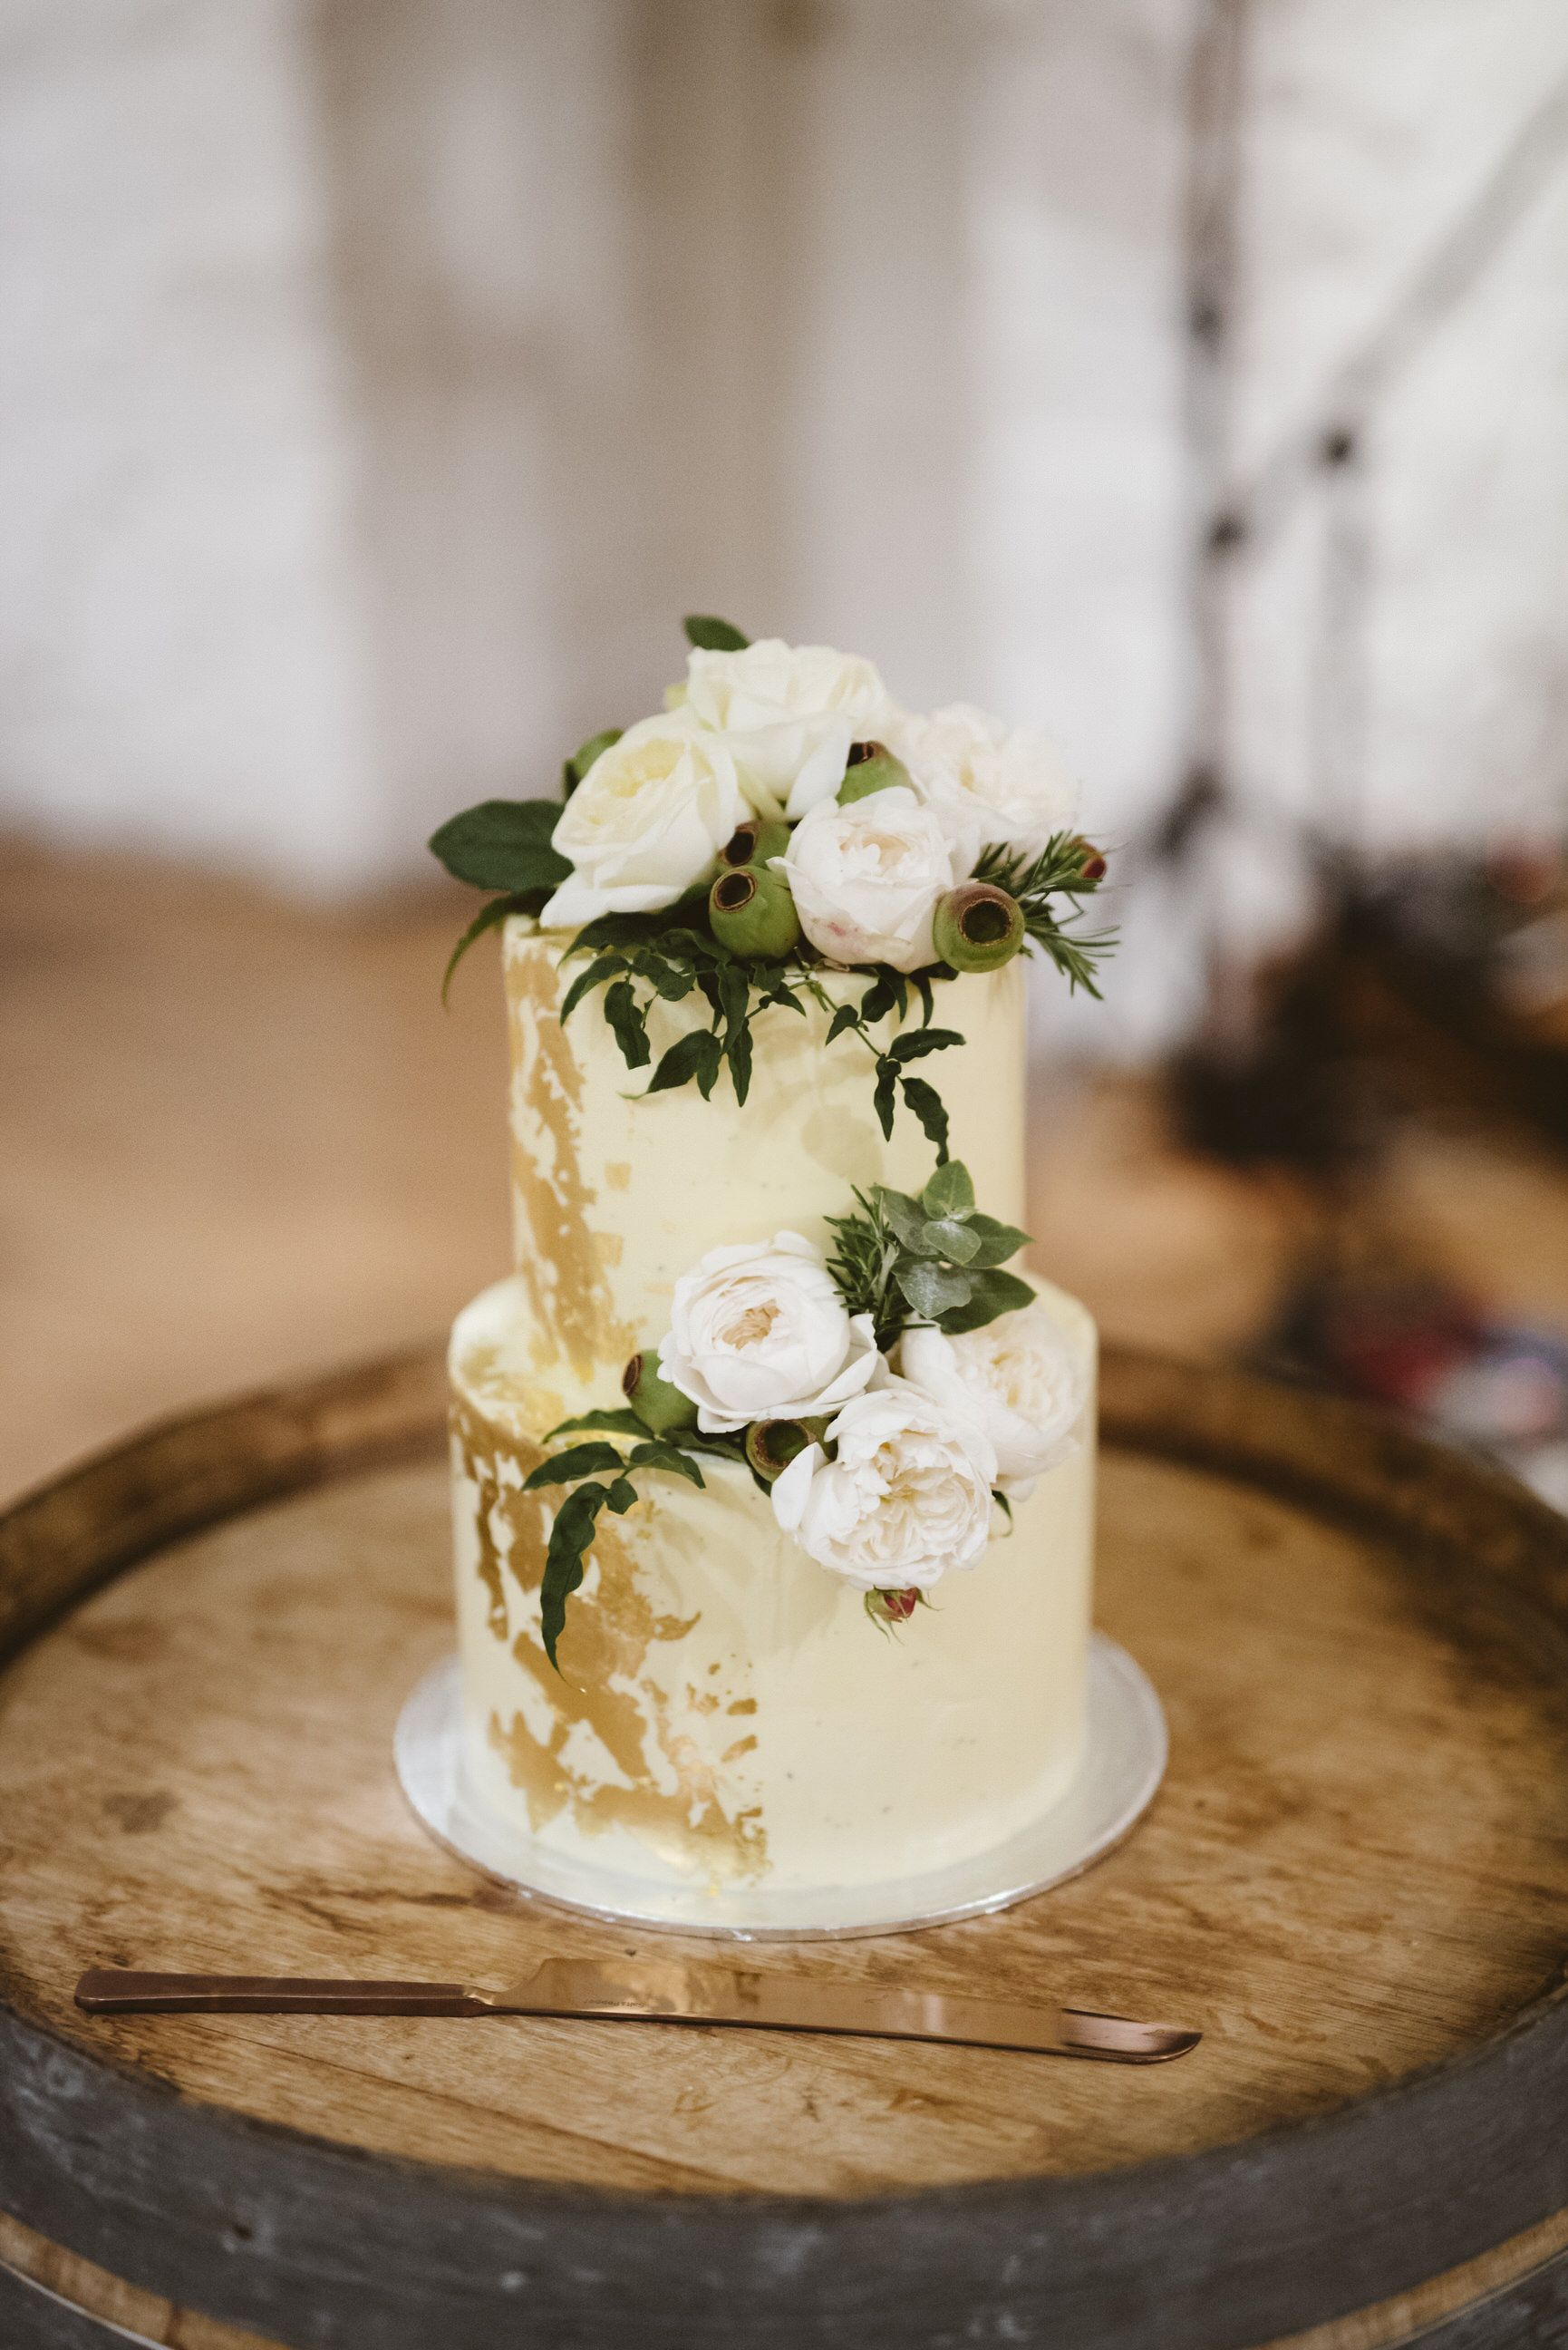 tier cake design gillian pollard venue inspiration emu bottom